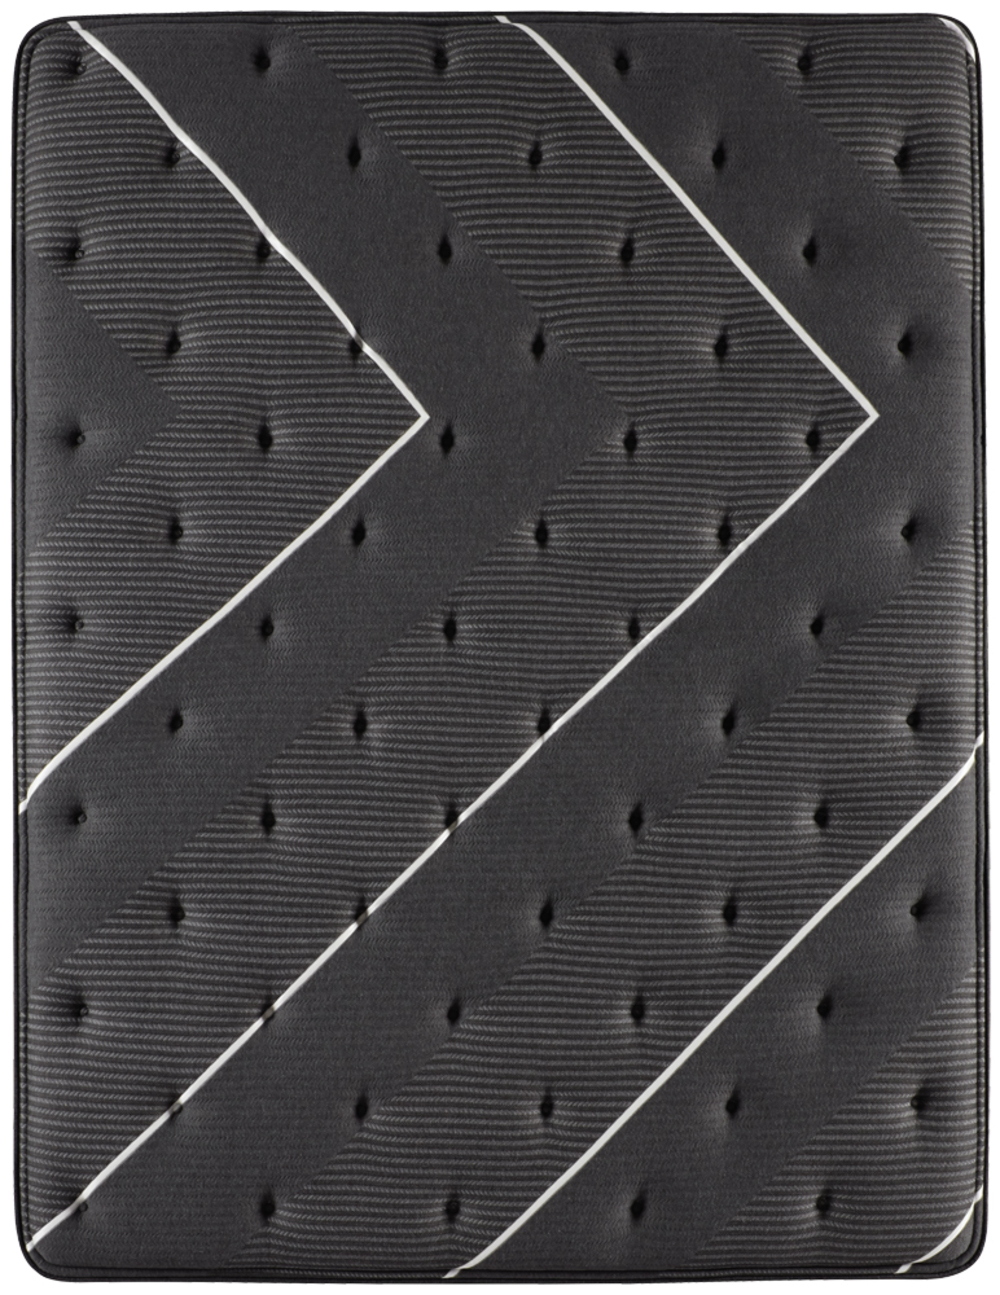 Beautyrest - BR Black C Class Medium Mattress with BR Advanced Motion Base